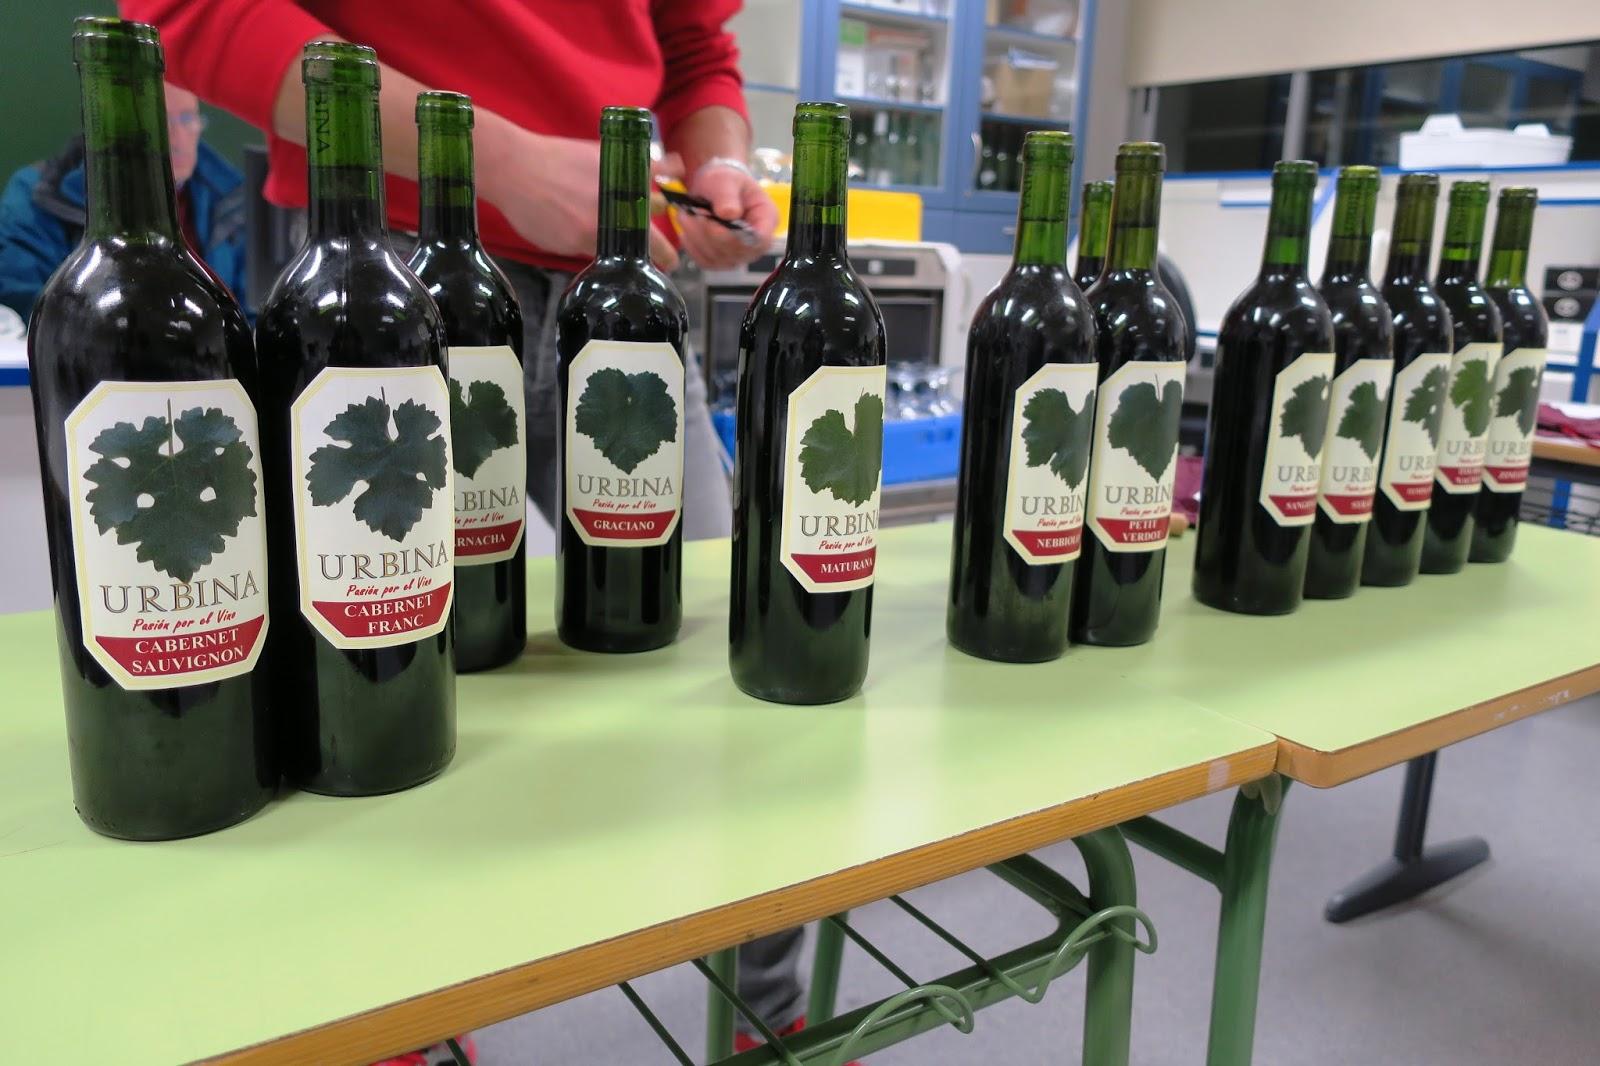 Urbina Vinos Blog: Viñedo Experimental con Diferentes Variedades de ...